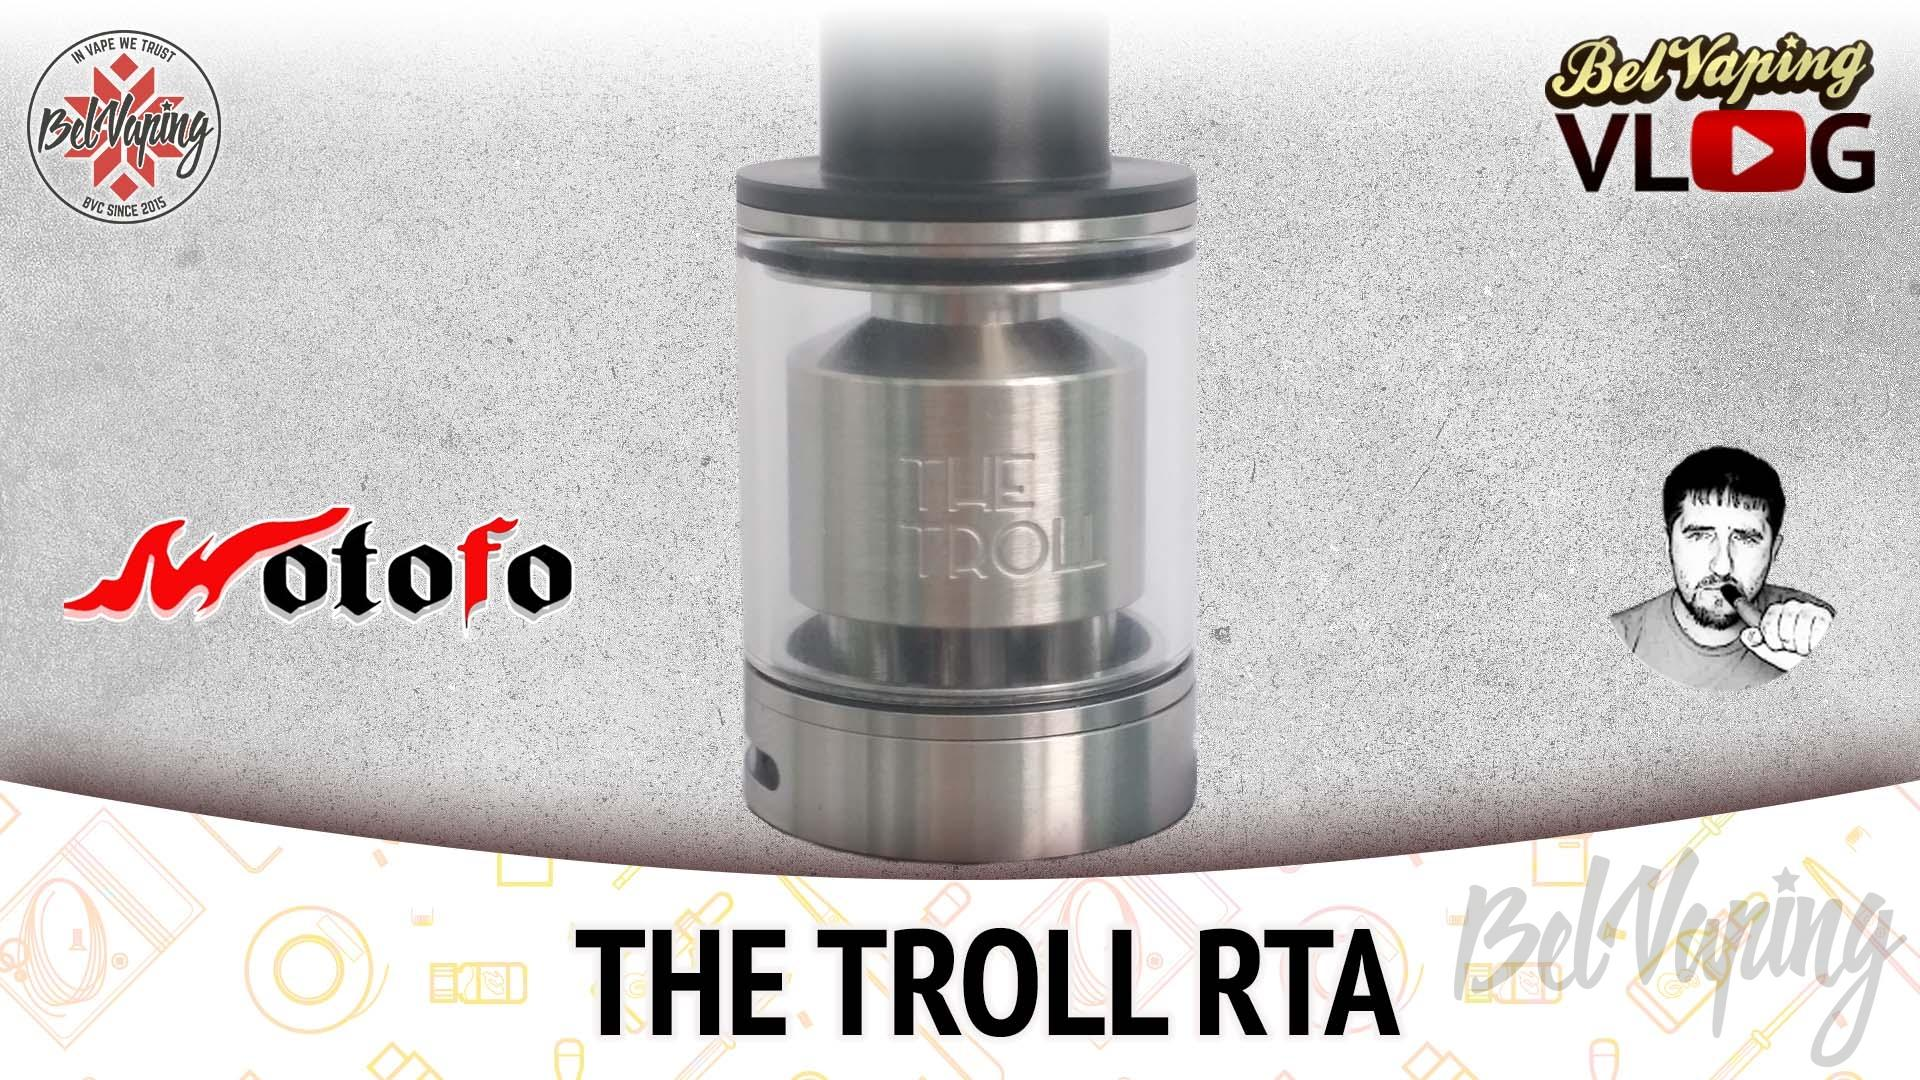 Обзор бака The Troll RTA